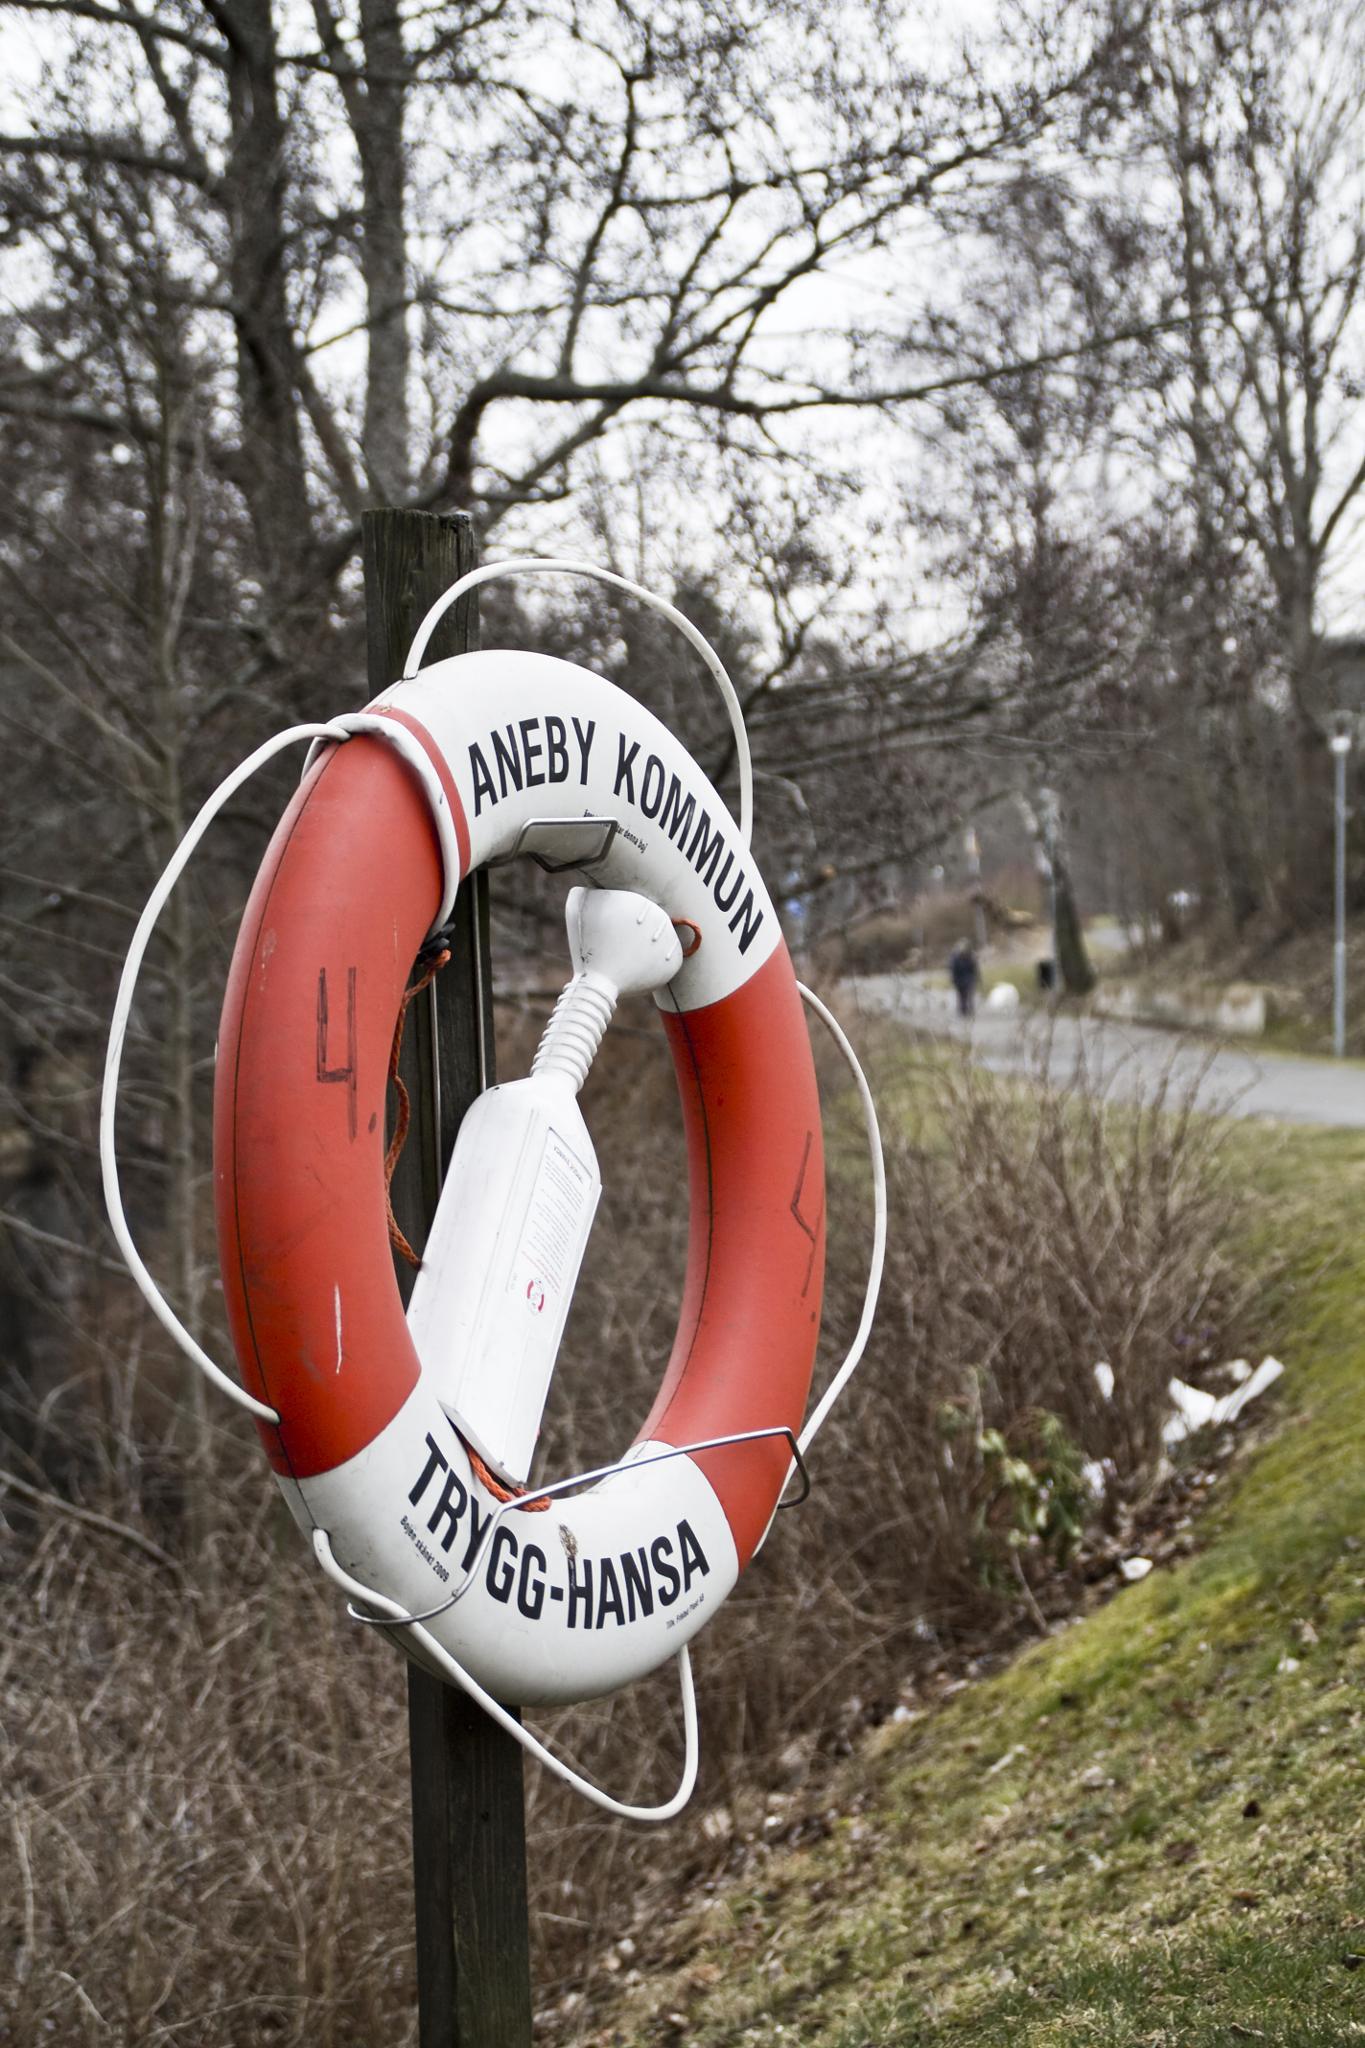 Saving lifes by johan.stoltwestling